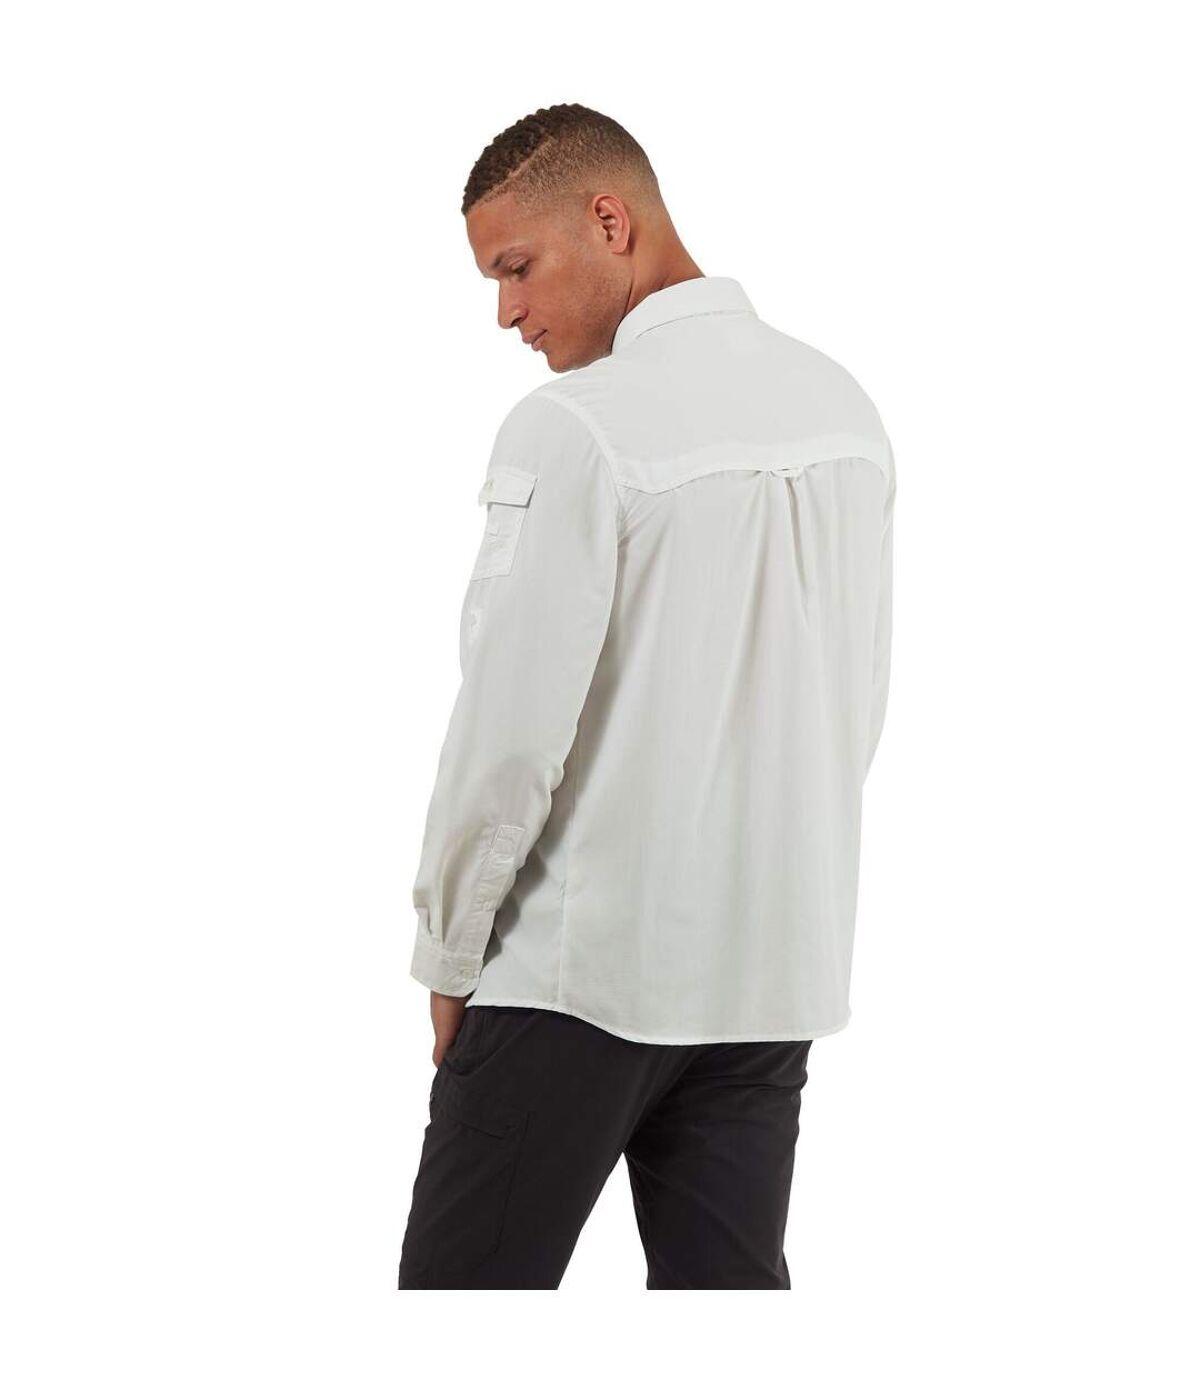 Craghoppers - Chemise manches longues ADVENTURE - Homme (Blanc) - UTCG1085